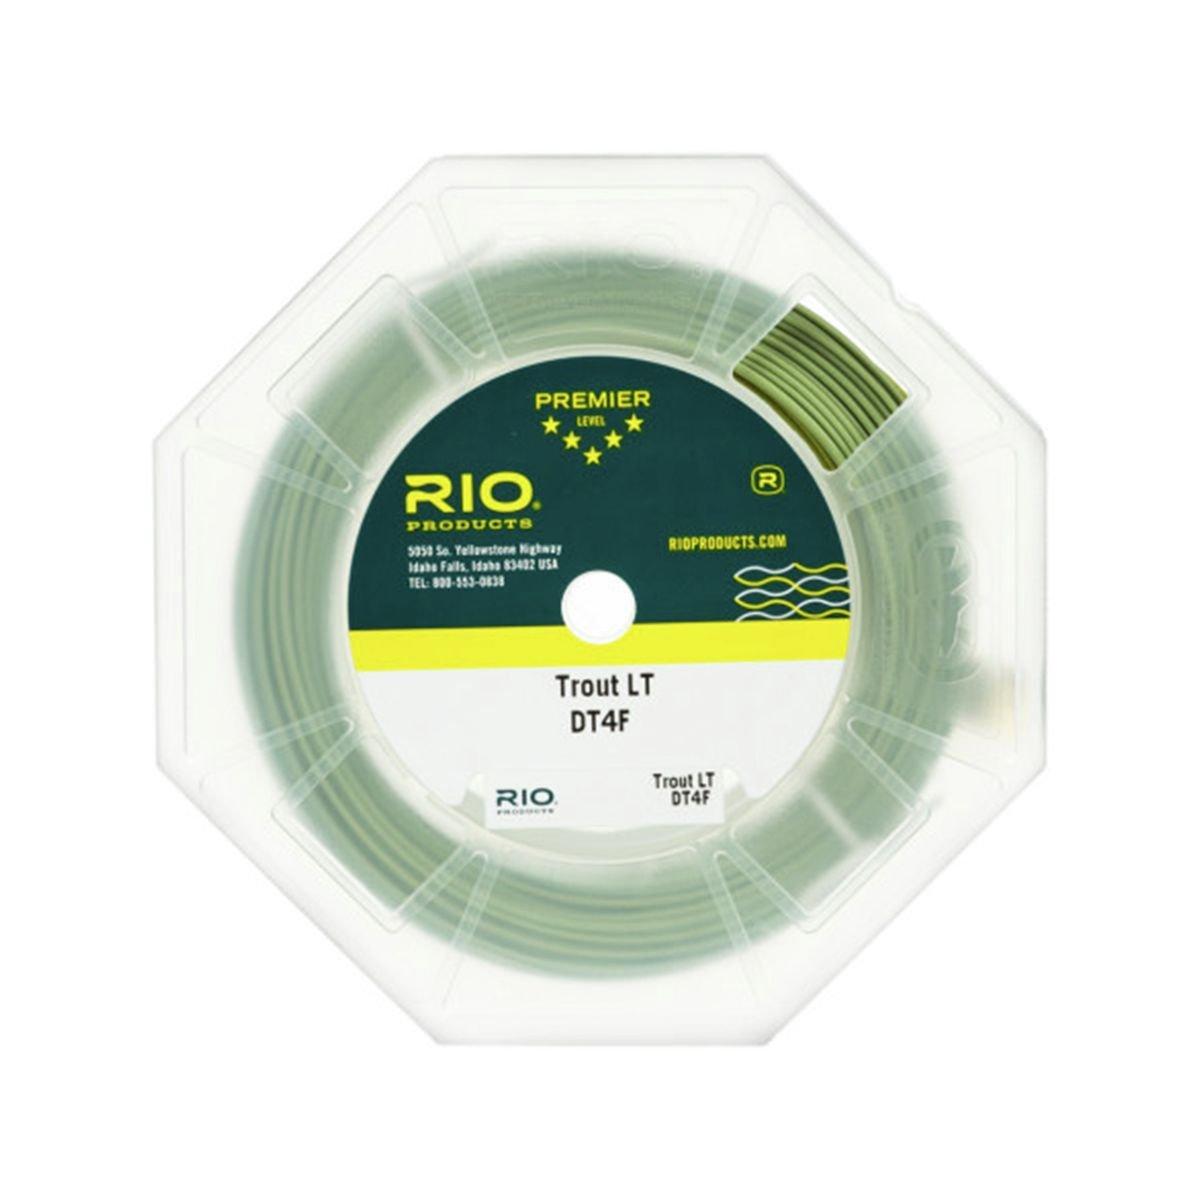 (DT6F, Sage) - RIO Products Rio Trout LT Fly Line   B0033MI3SI